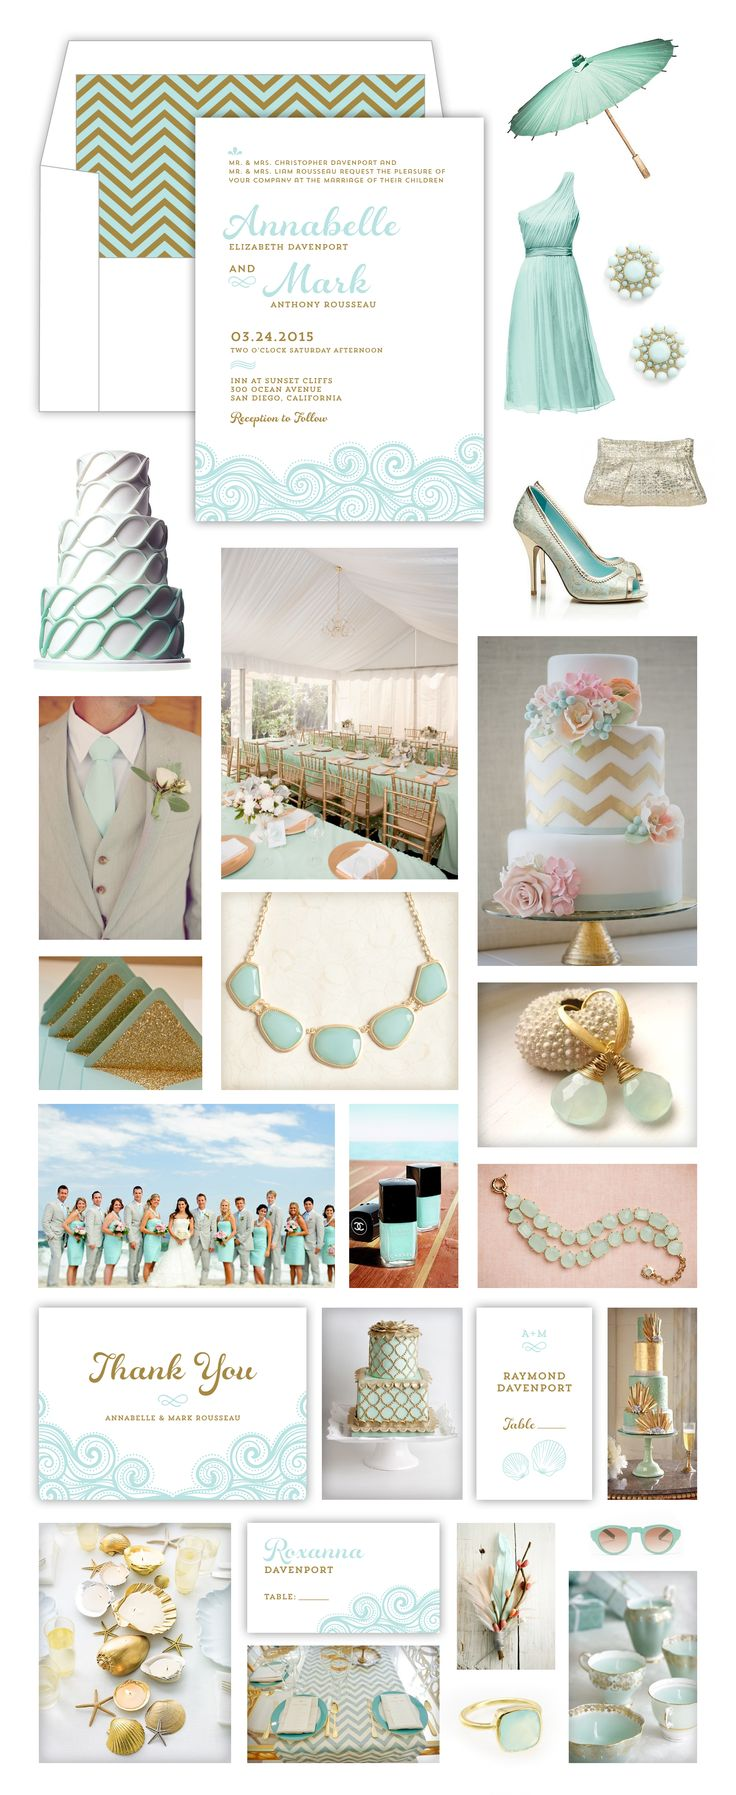 Mint Gold Beach Wedding -- Waves, Sea Shells, Sea Glass, Chevron -- Mint Gold White Wedding Stationary by Lauren DiColli Hooke for KleinfeldPaper.com